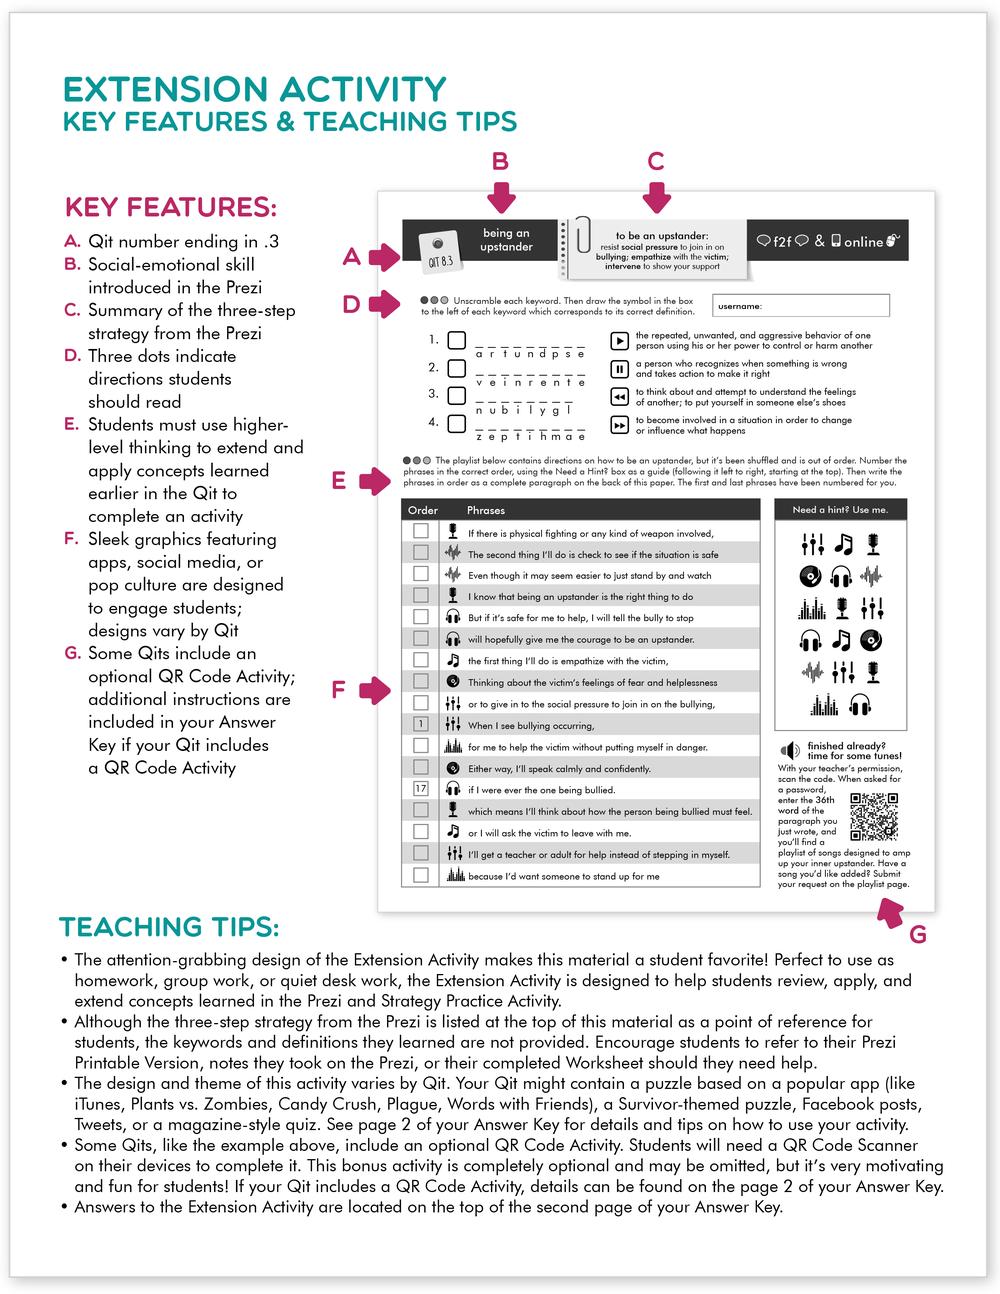 TeachingTipsGuide3.png